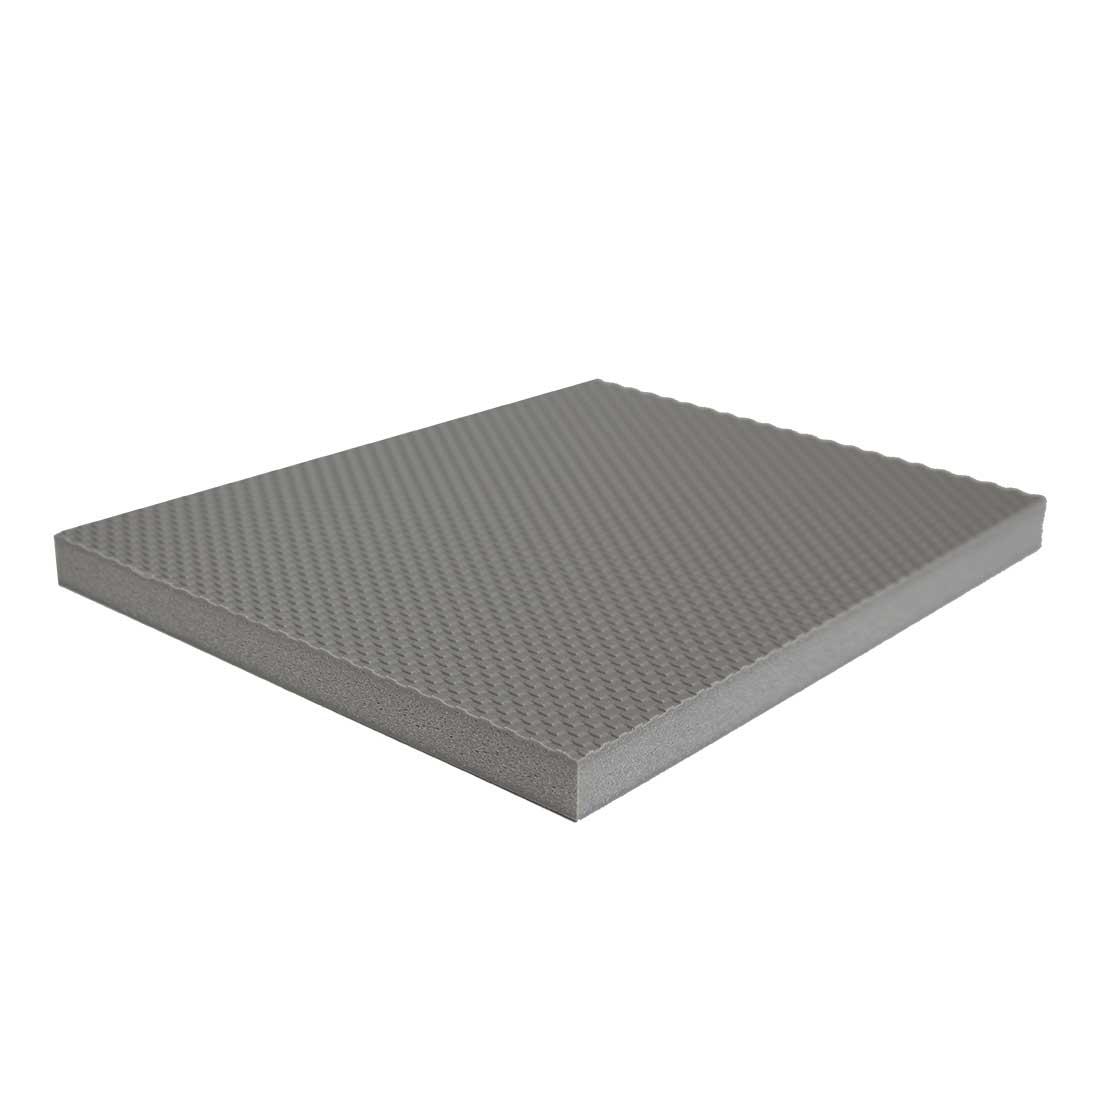 Vinplast PP-foam Plaat Antislip Grijs RAL7004 3000x2000x10mm